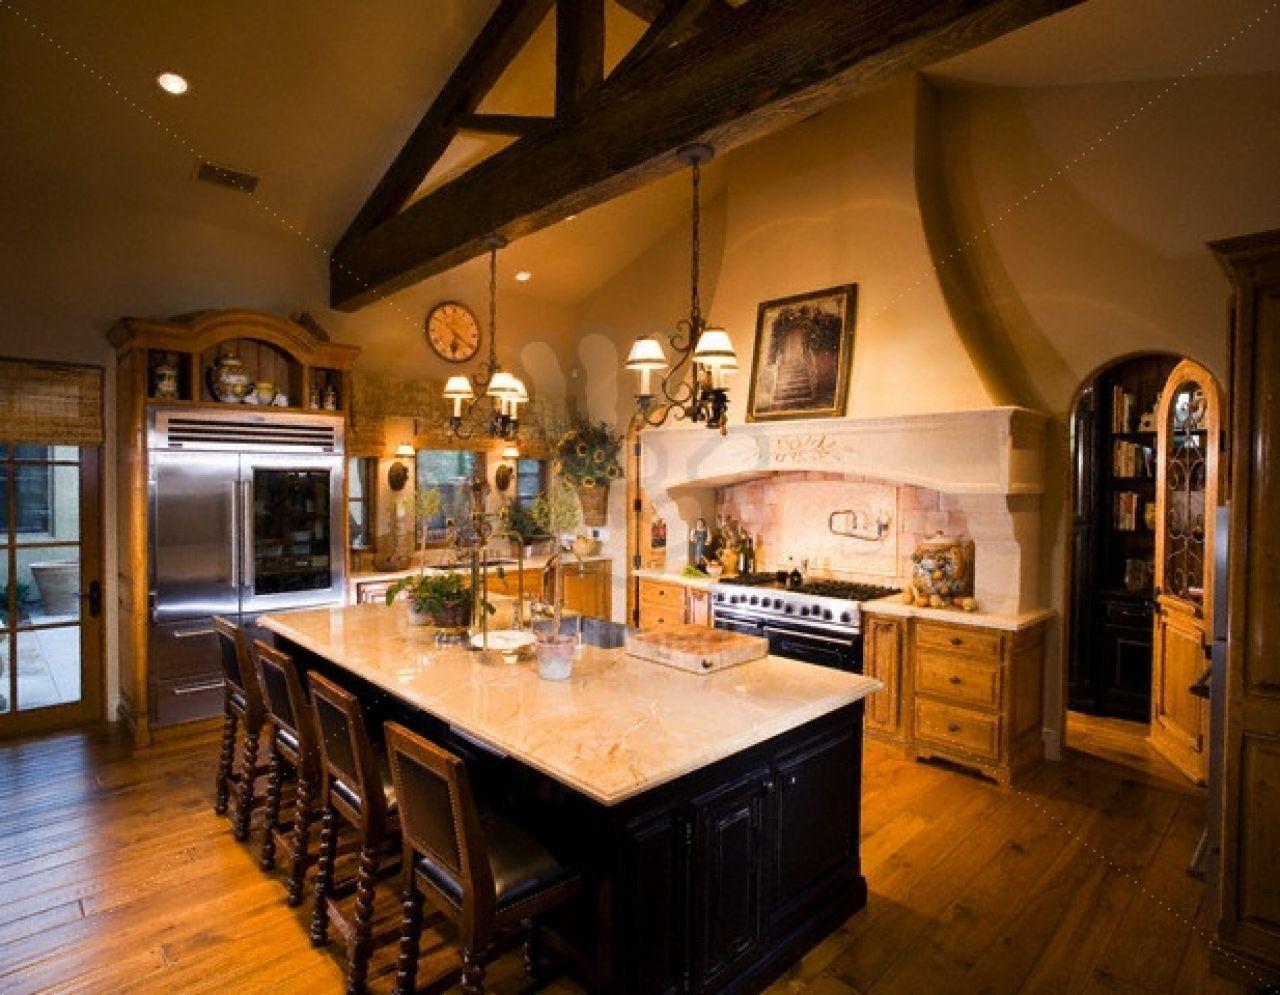 9 Simplest Ways To Build Rustic Tuscan Kitchen Design Tuscan Decorating Kitchen Tuscany Kitchen Tuscan Kitchen Design